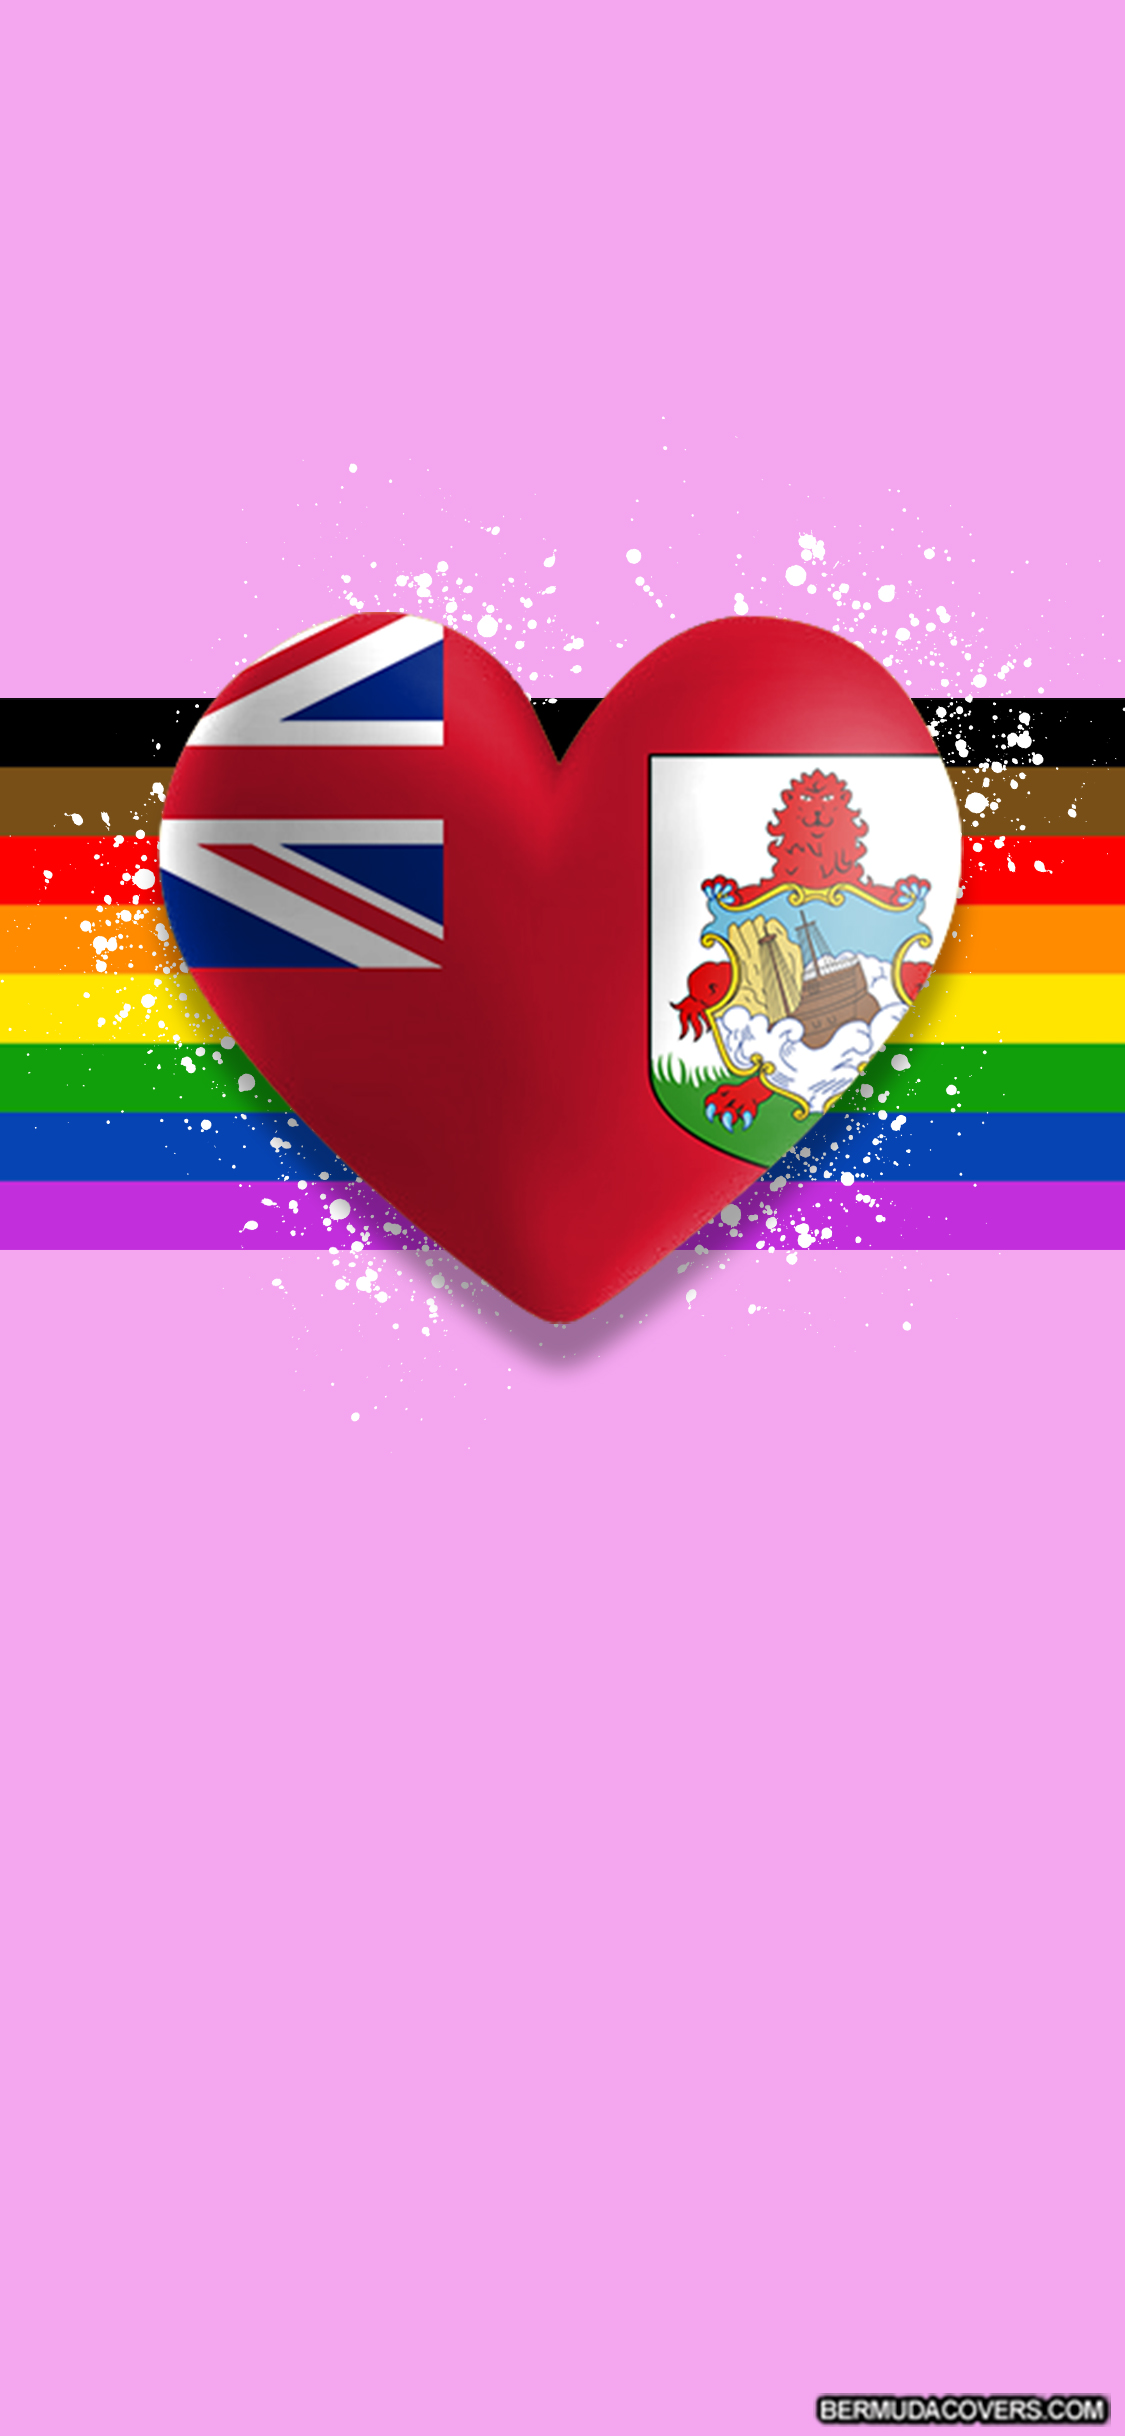 Phone Wallpaper Wednesday Phone Wallpaper LGBTQ Bermuda Pride Parade  Heart